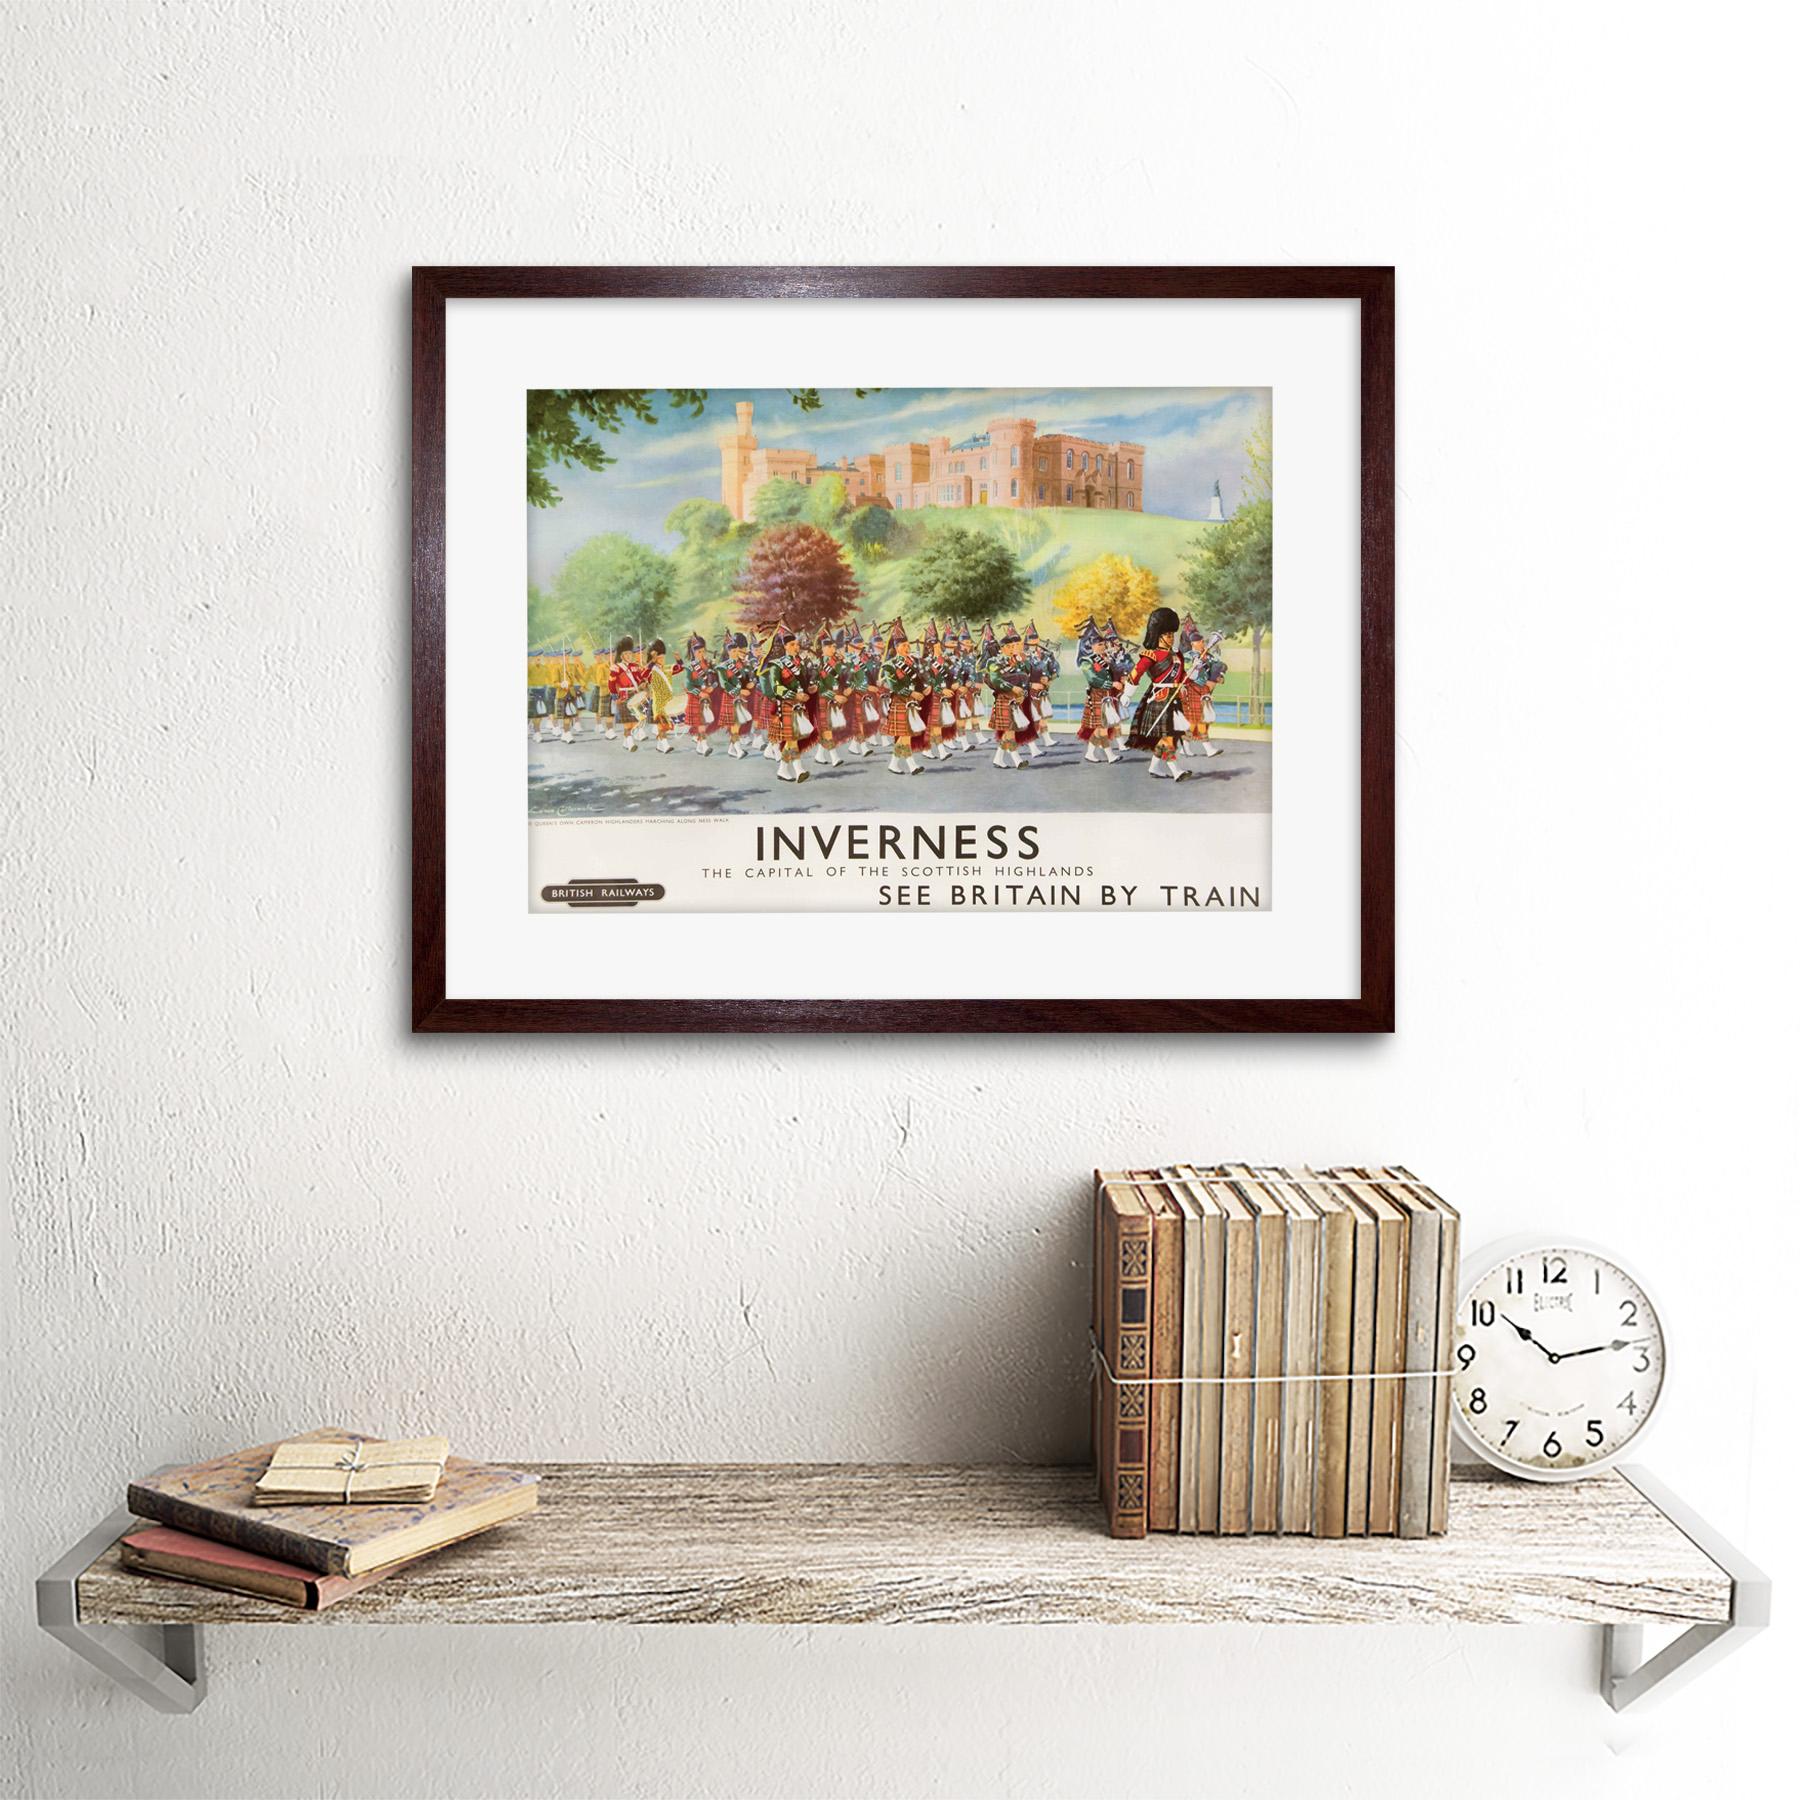 thumbnail 8 - Travel-Inverness-British-Railways-Scotland-Highlanders-Framed-Art-Print-12x16-034